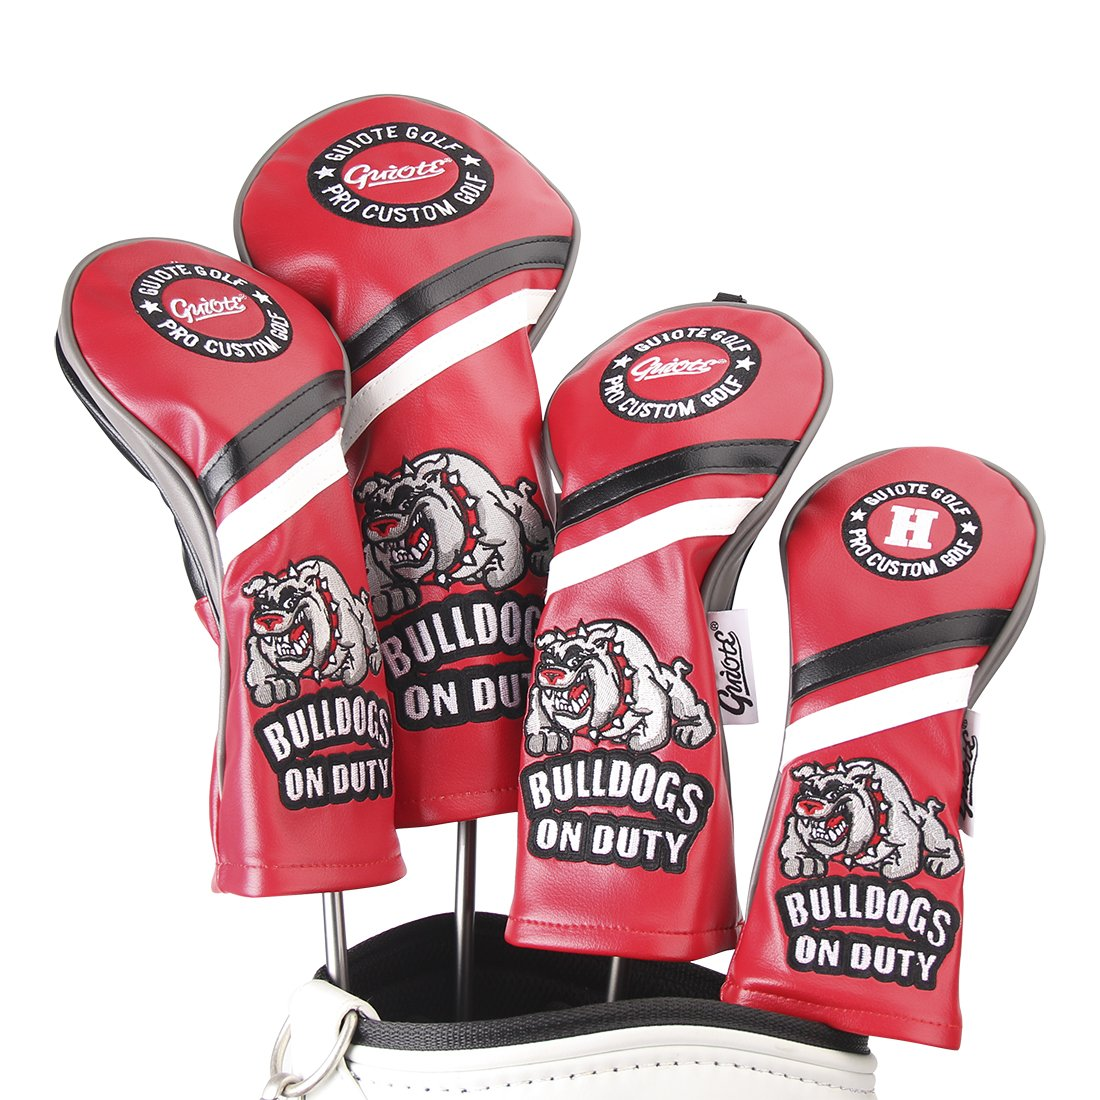 Guiote ゴルフヘッドカバー Golf head covers クラブヘッドカバー ウッドカバー ドライバー 新デザイン 交換可能な番号タグ付き(#2.#3.#4.#5.X) 4個セット B076NPRNXH Bulldogs-Red Bulldogs-Red